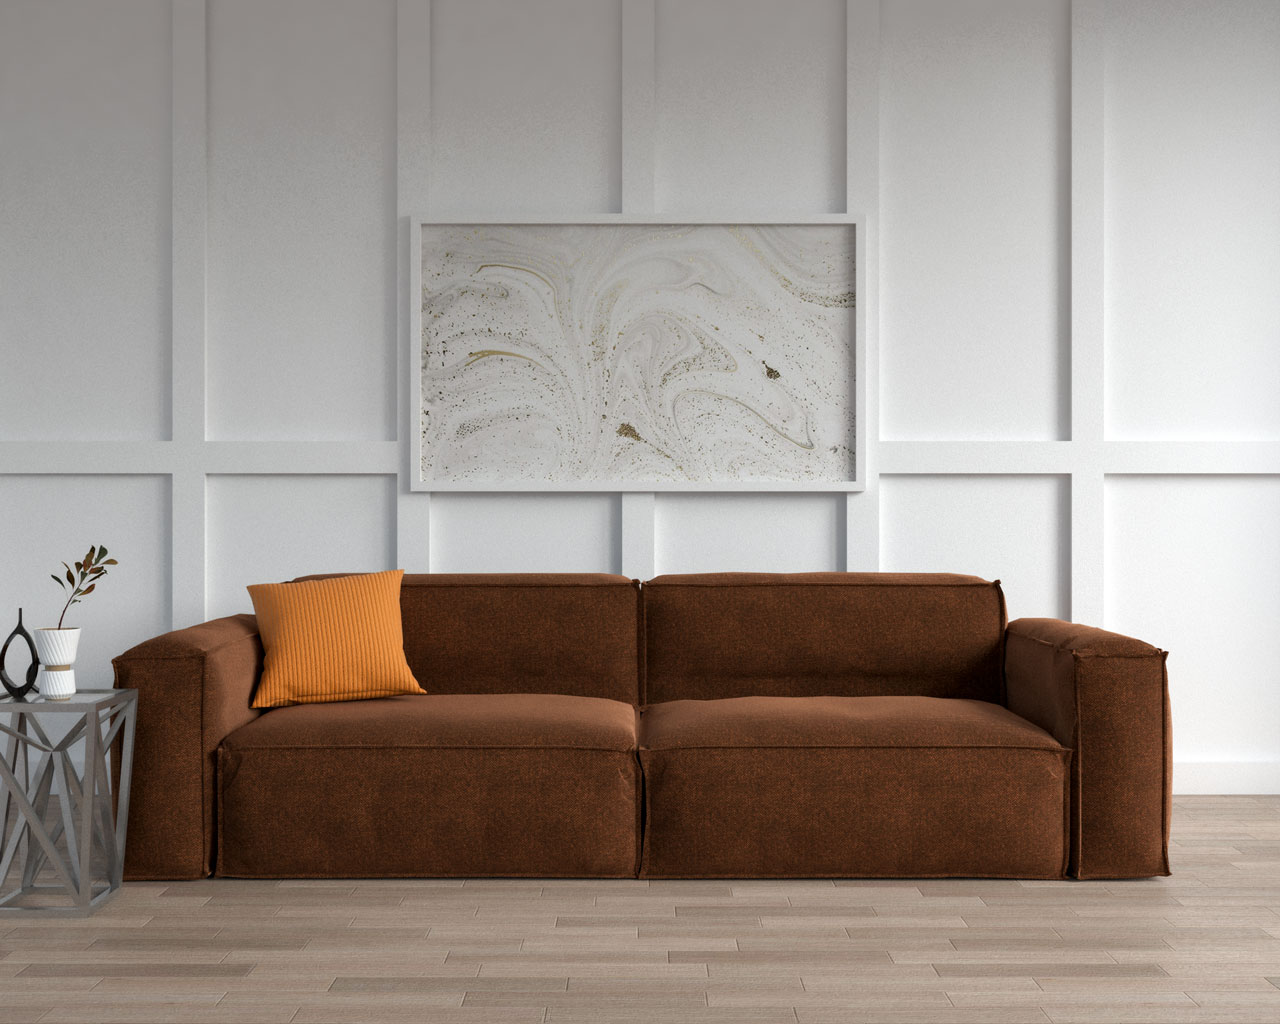 Brown sofa with orange decorative pillow